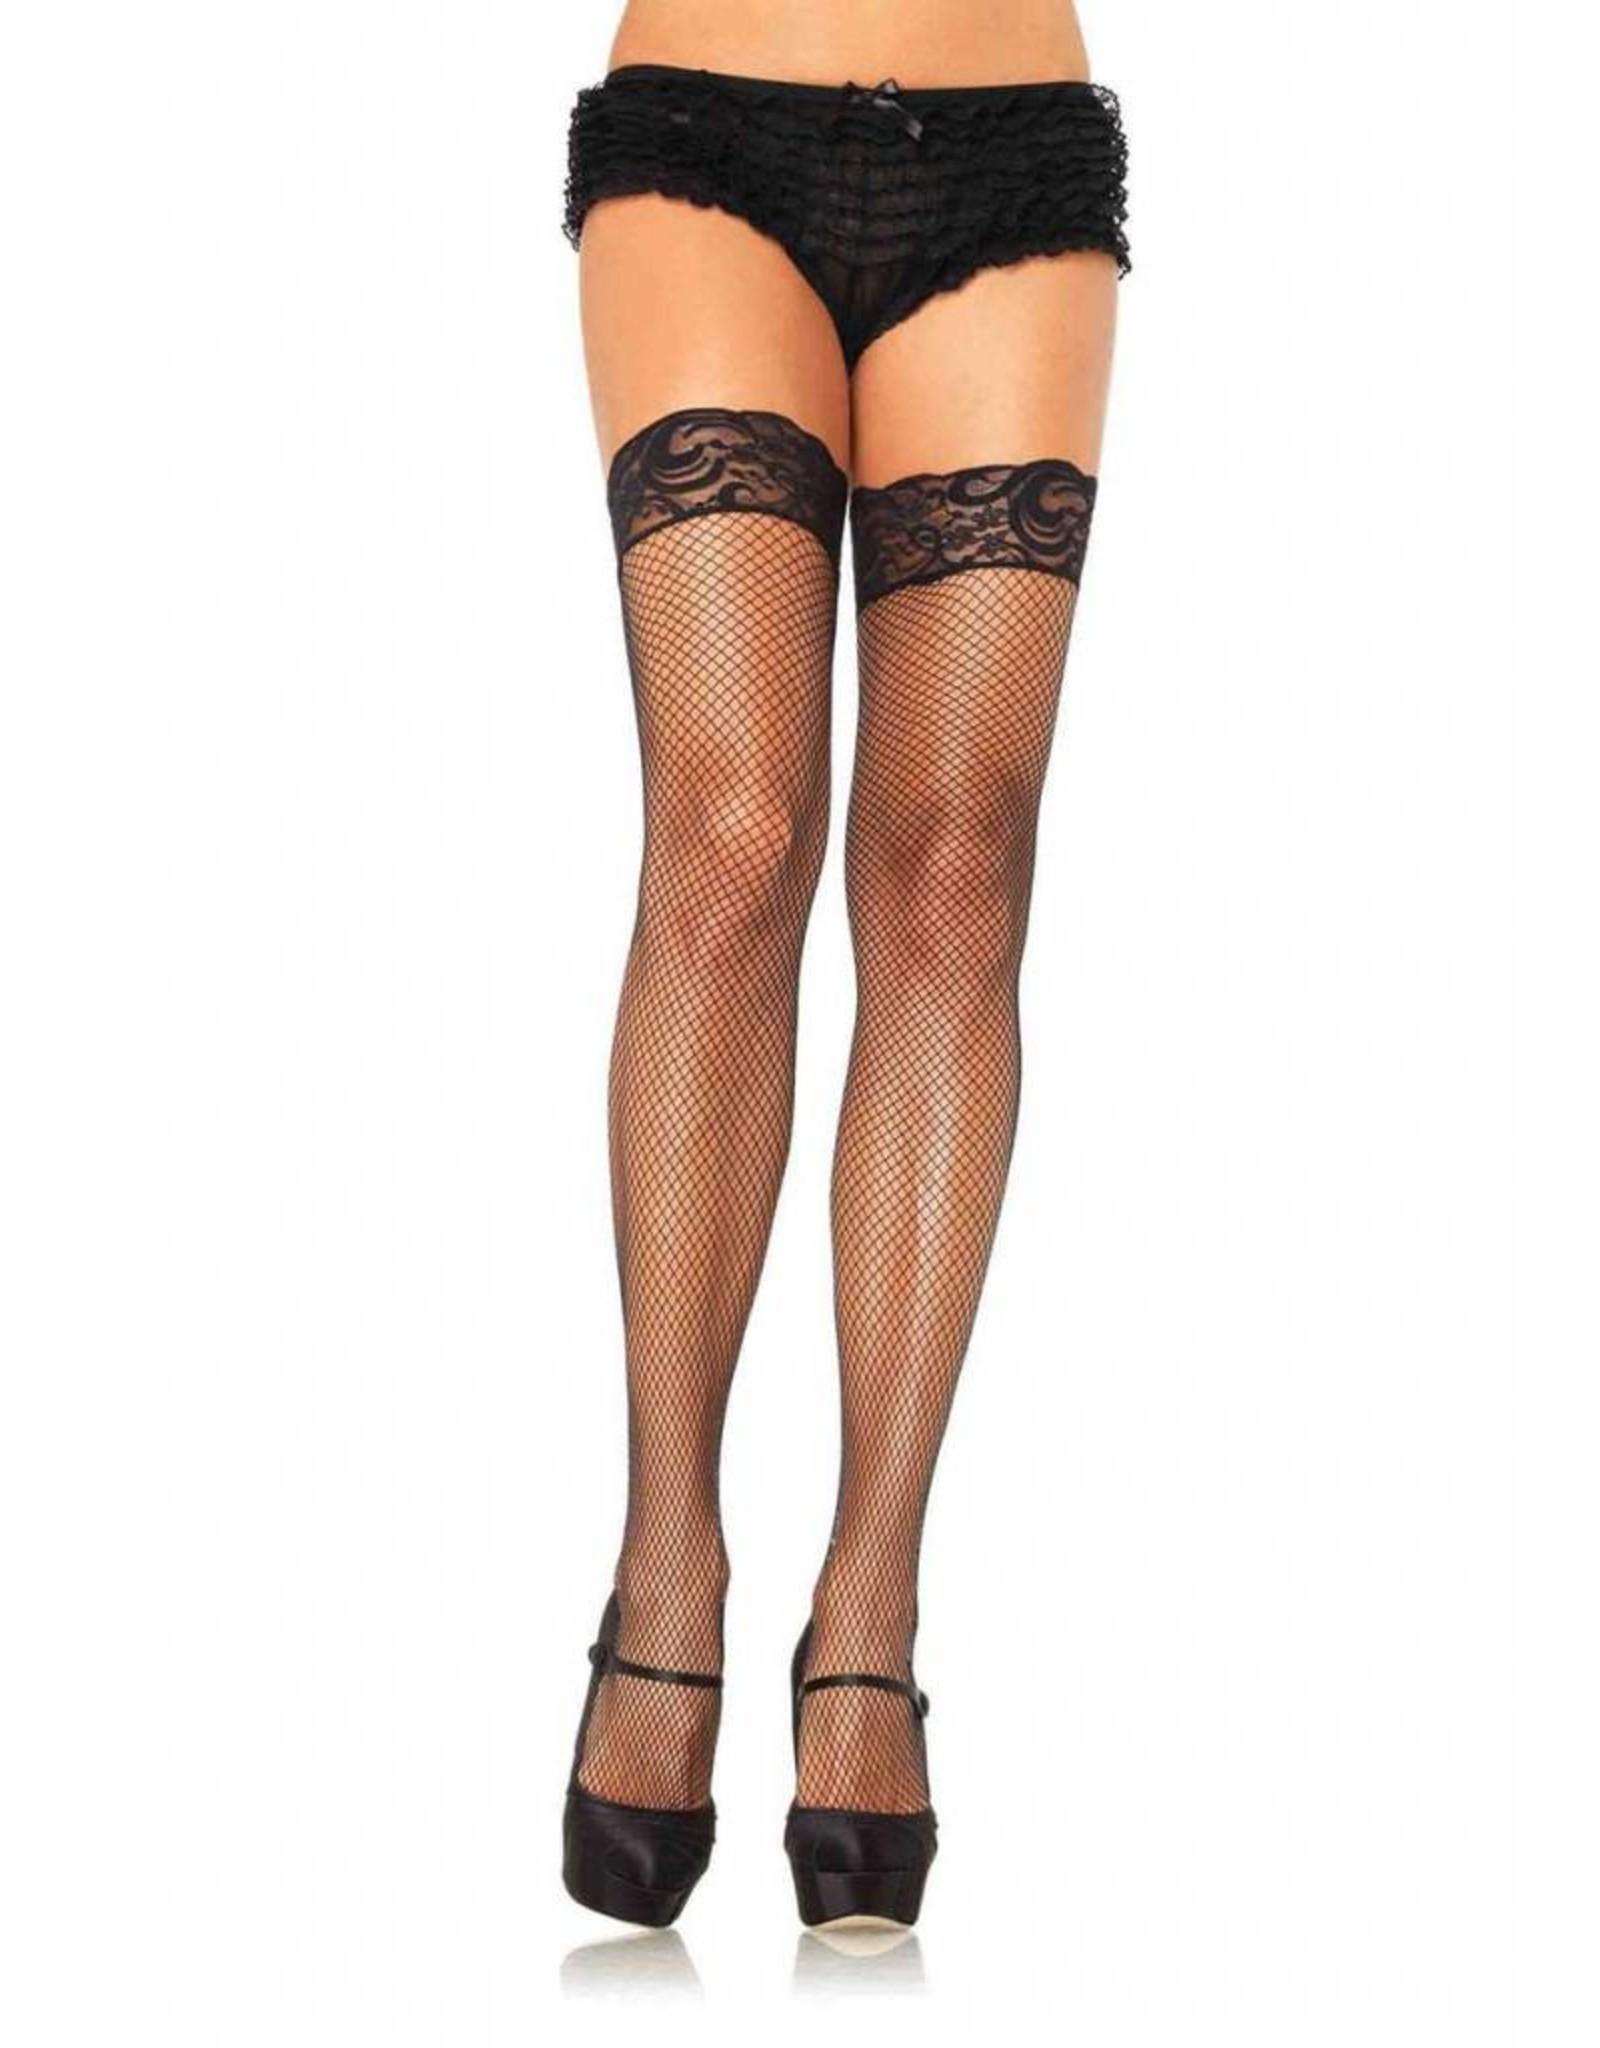 Leg Avenue Fishnet Thigh High Black